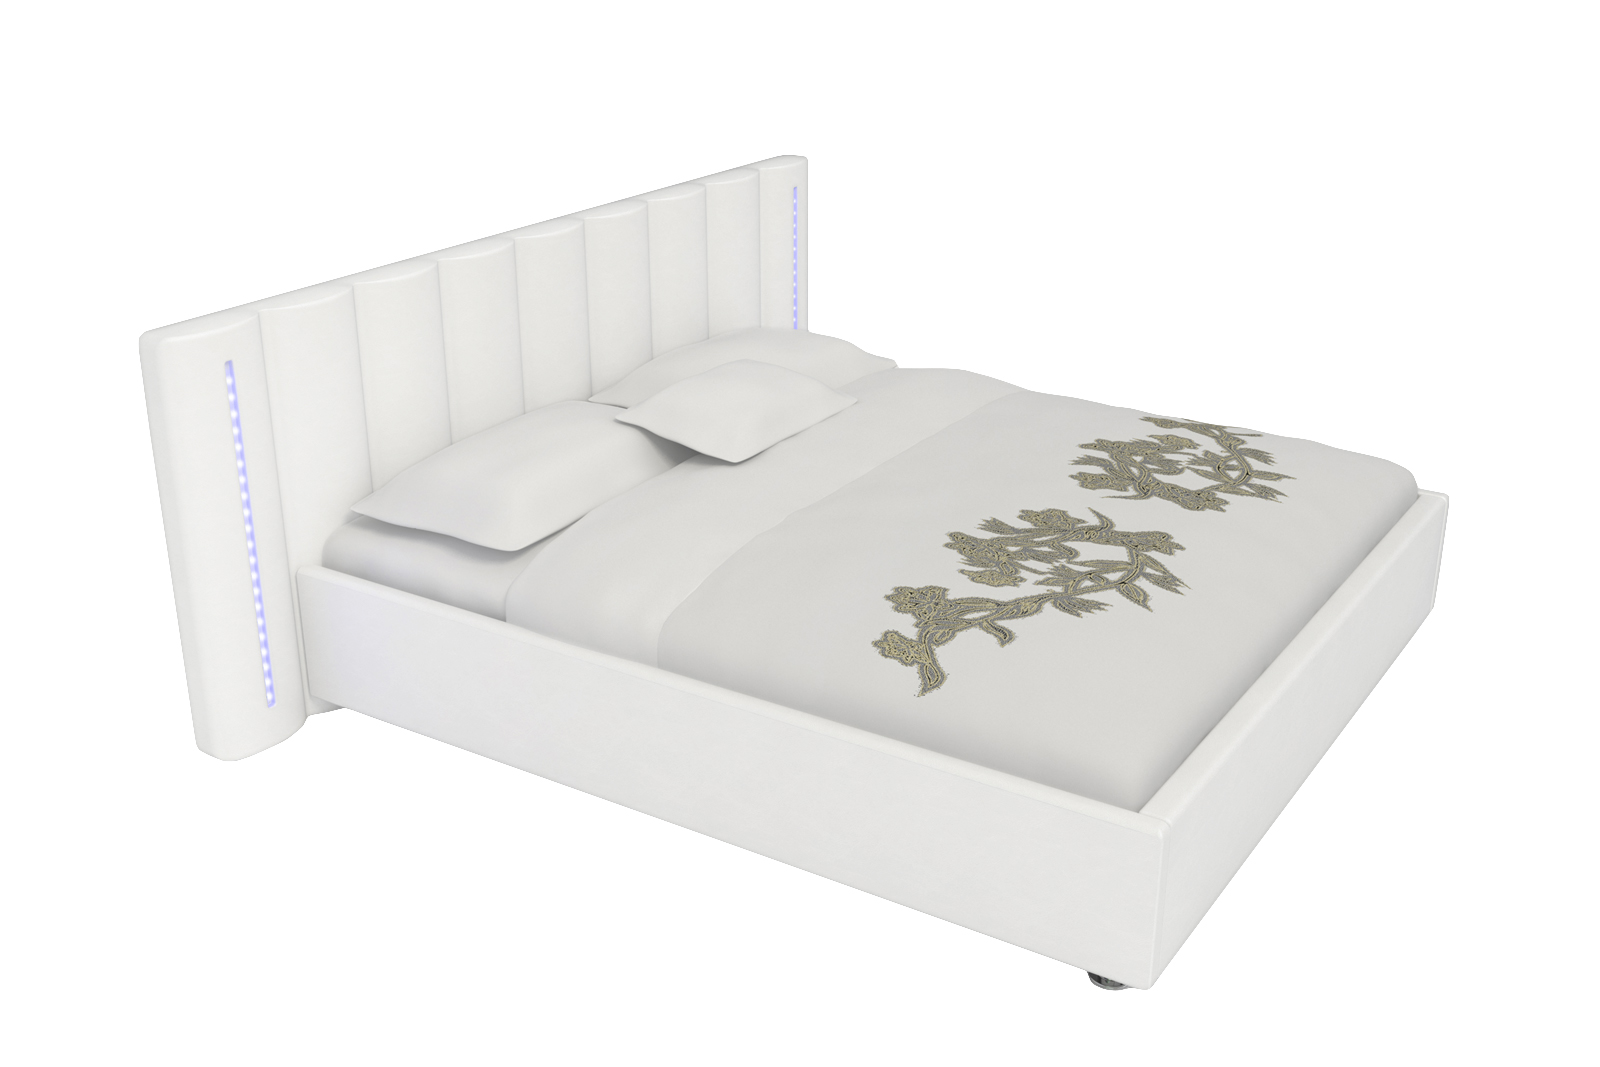 sale polsterbett g nstig 180x200 cm wei mit led beleuchtung reno. Black Bedroom Furniture Sets. Home Design Ideas